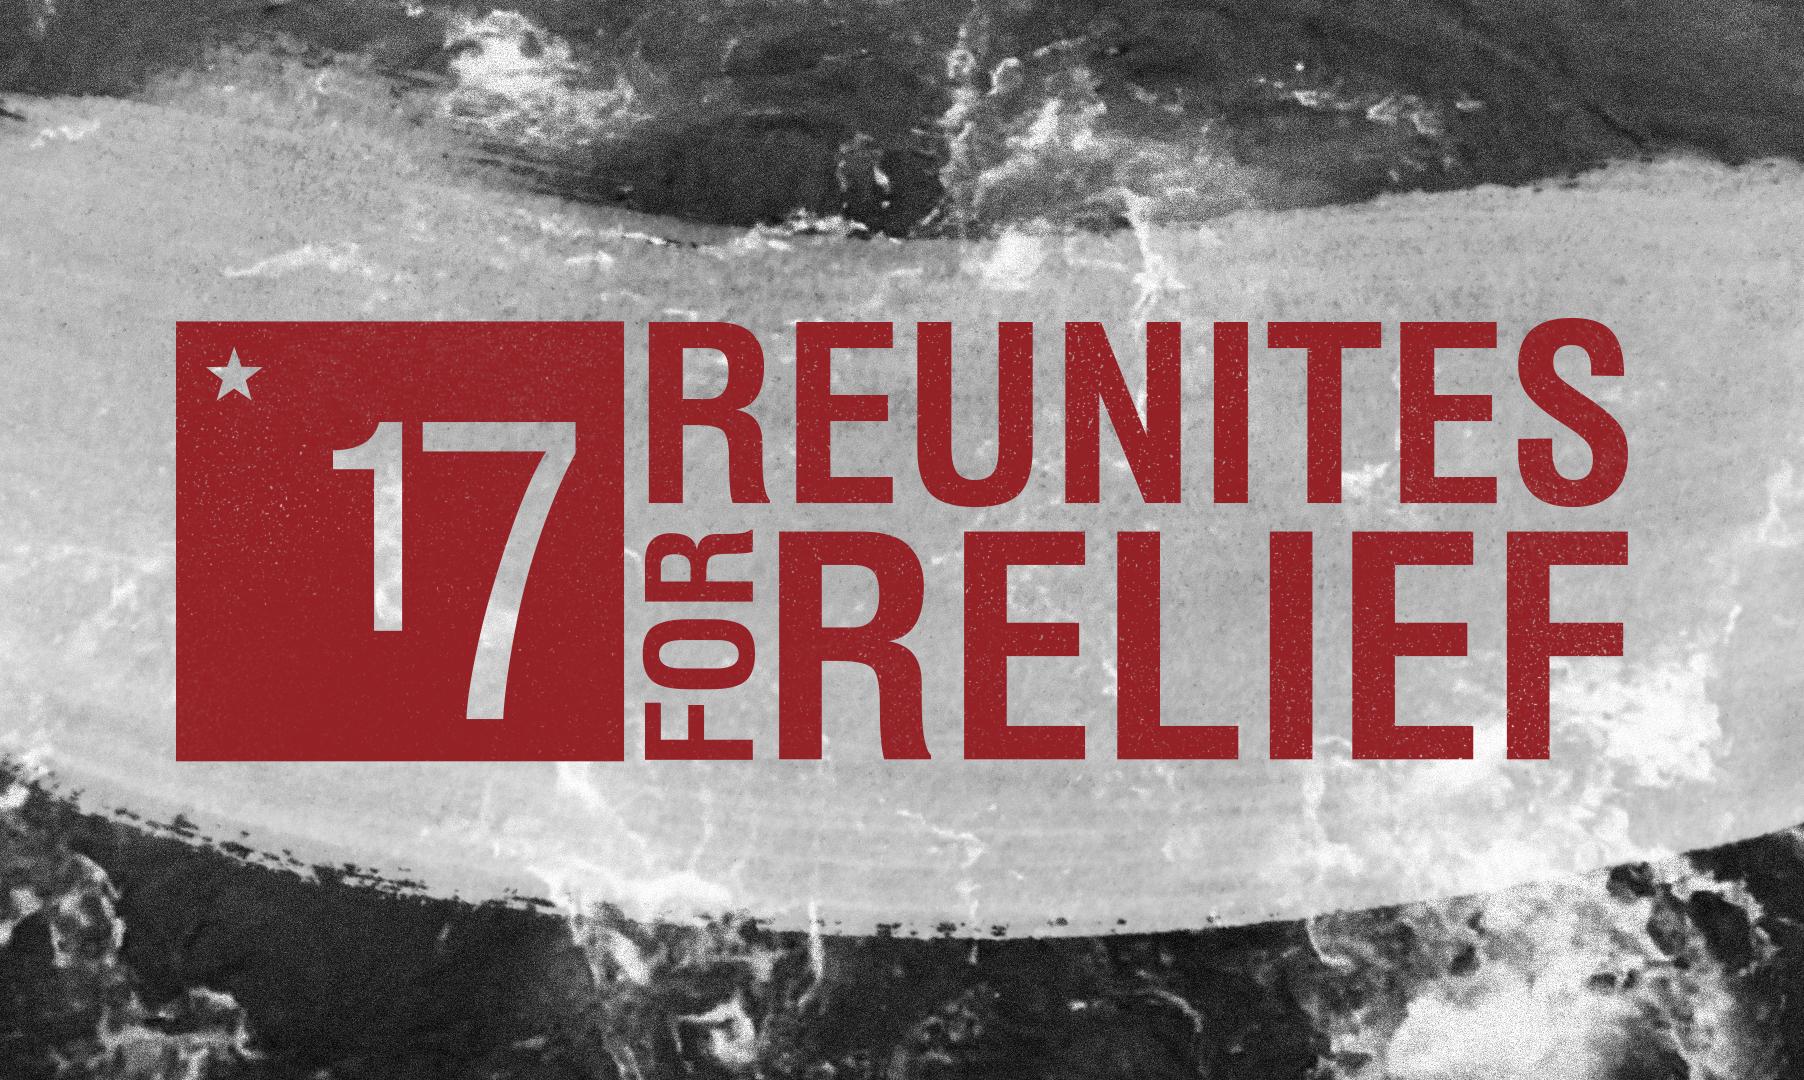 Reunites_for_ Relief_2_web.jpg